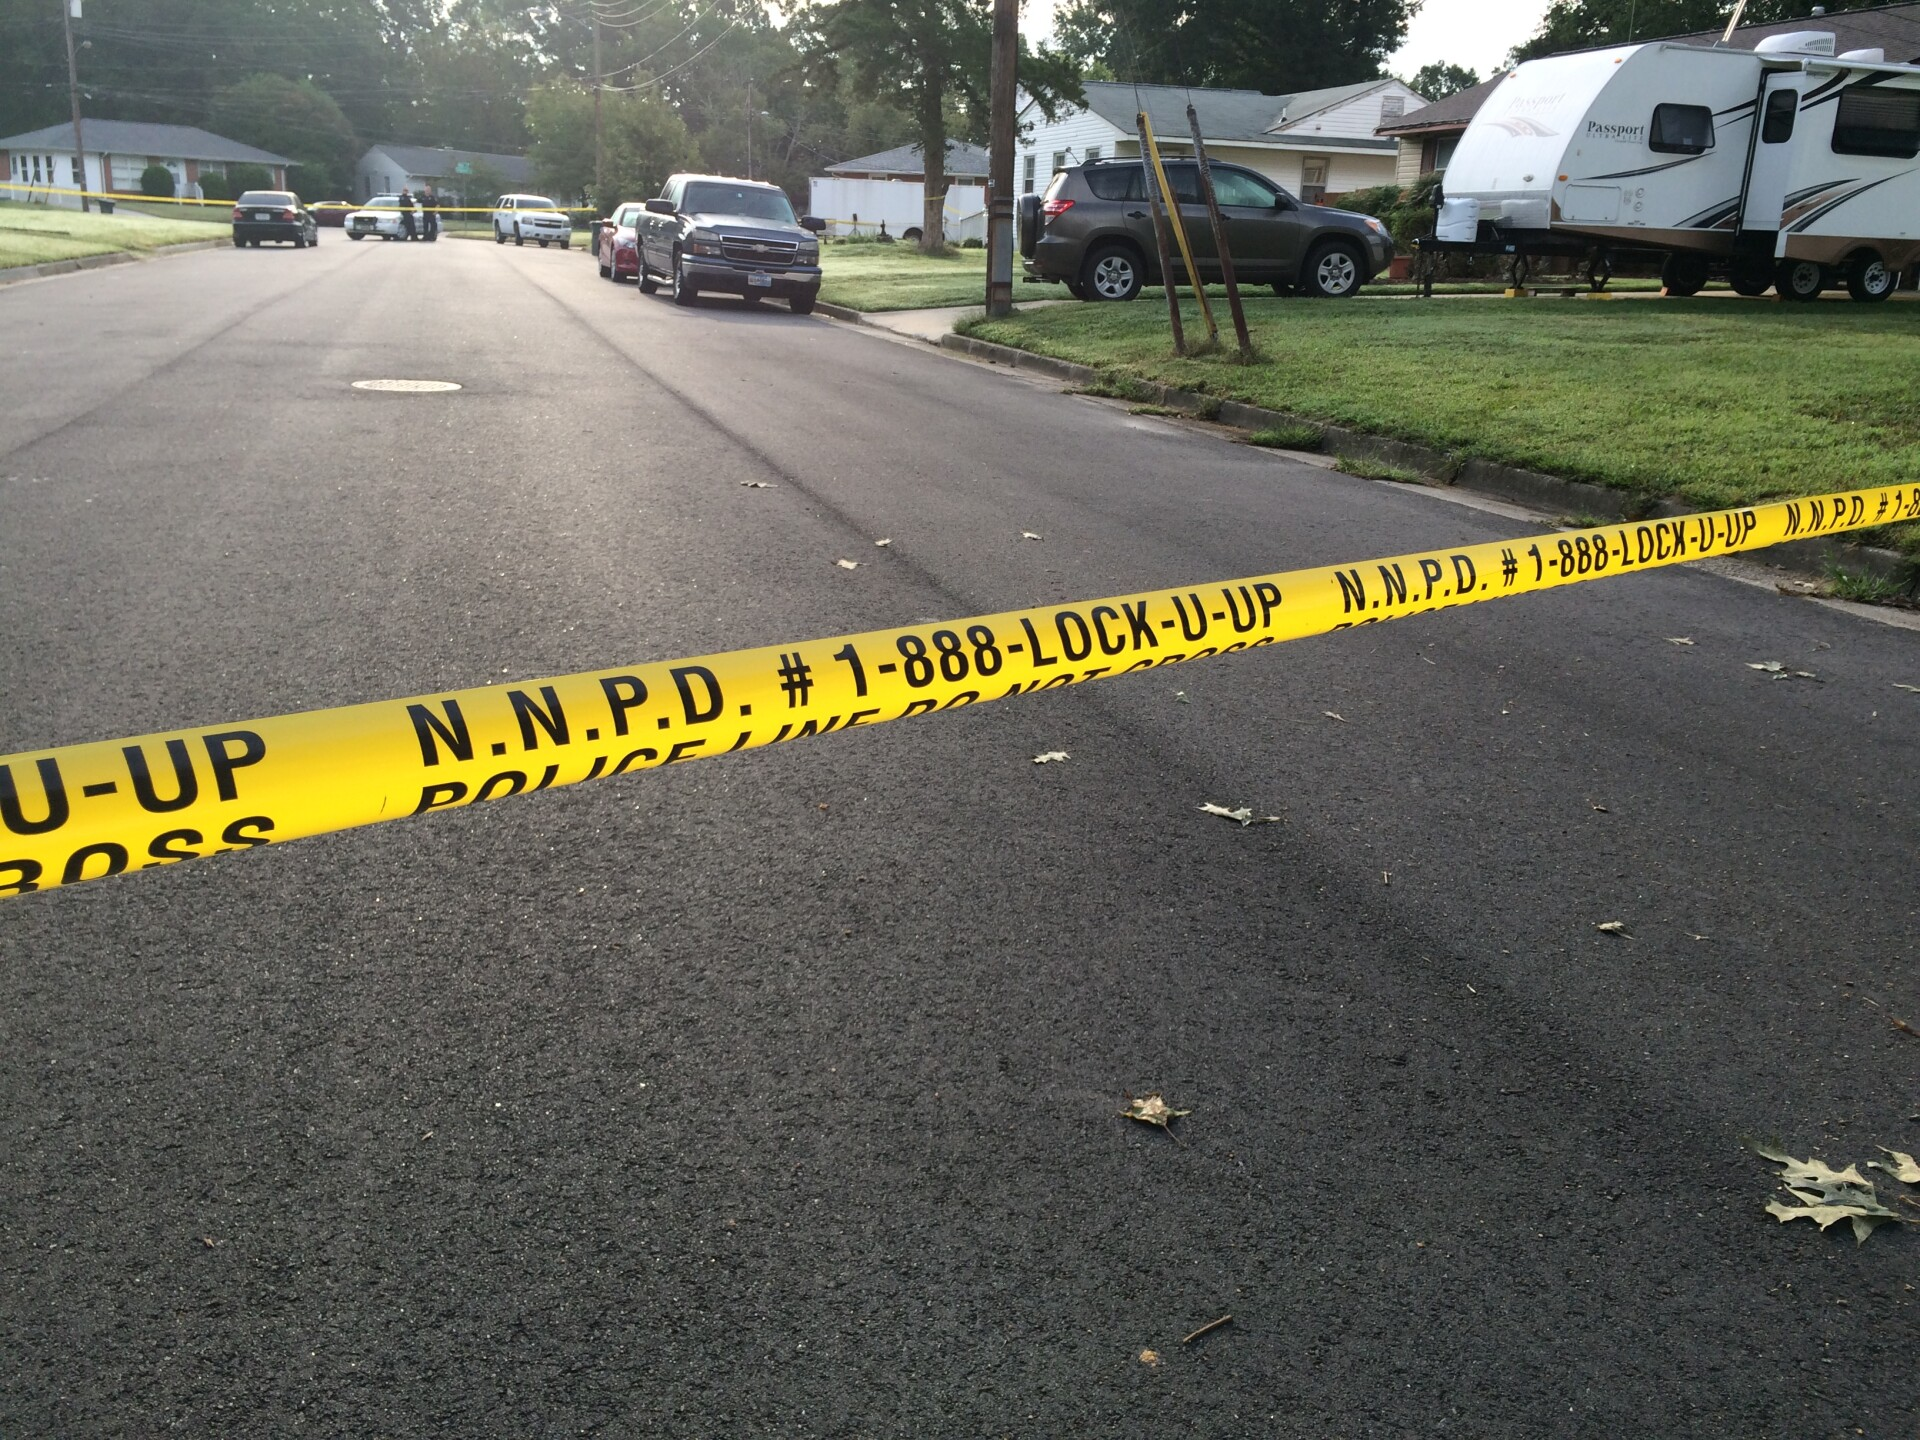 Photos: Man killed, woman injured in shooting at Newport News houseparty